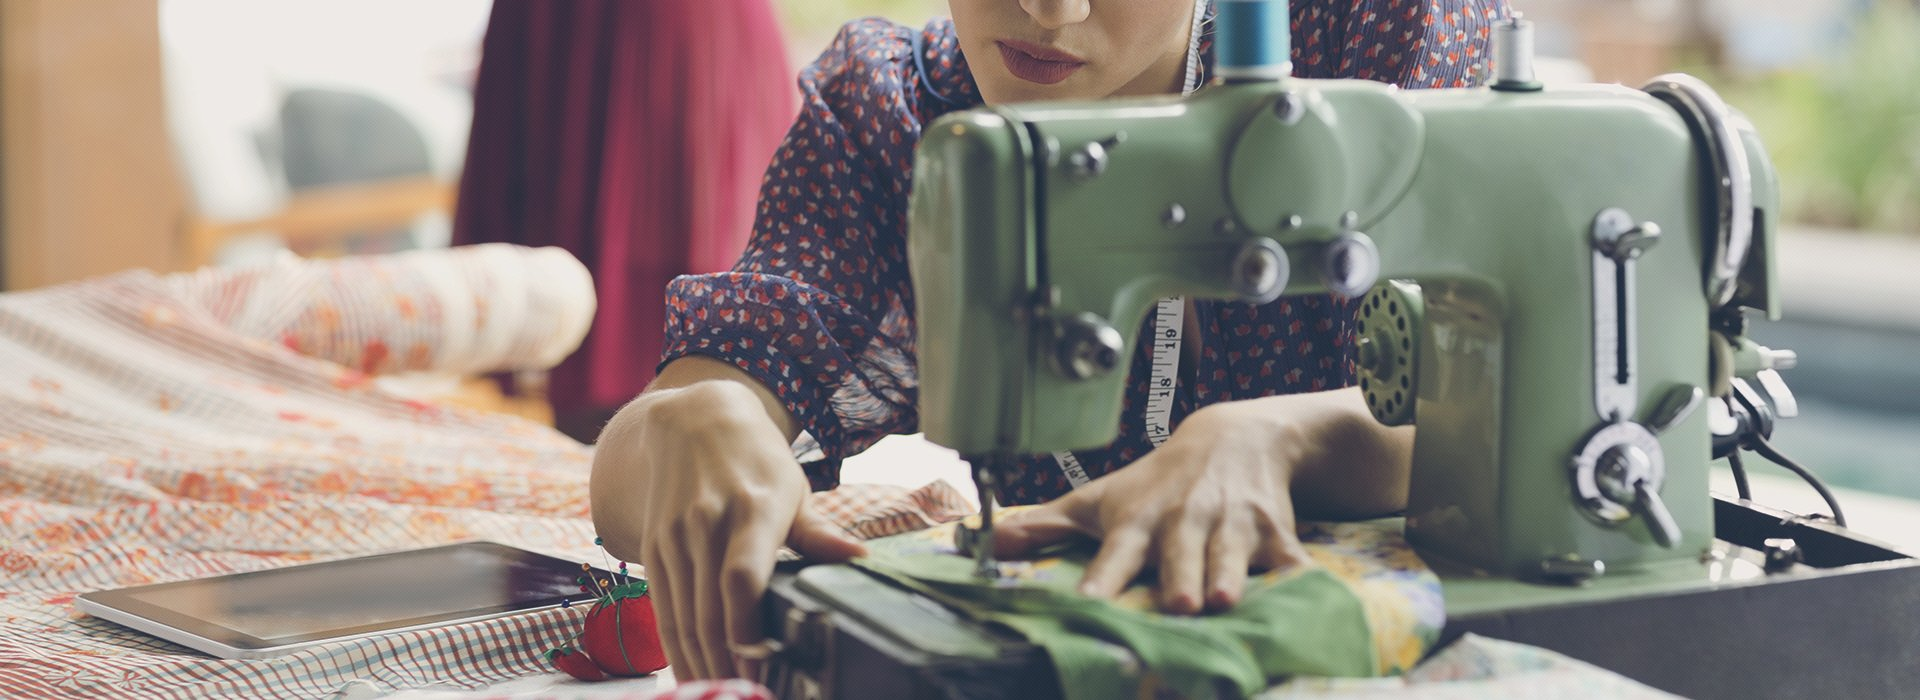 quality sewing machine